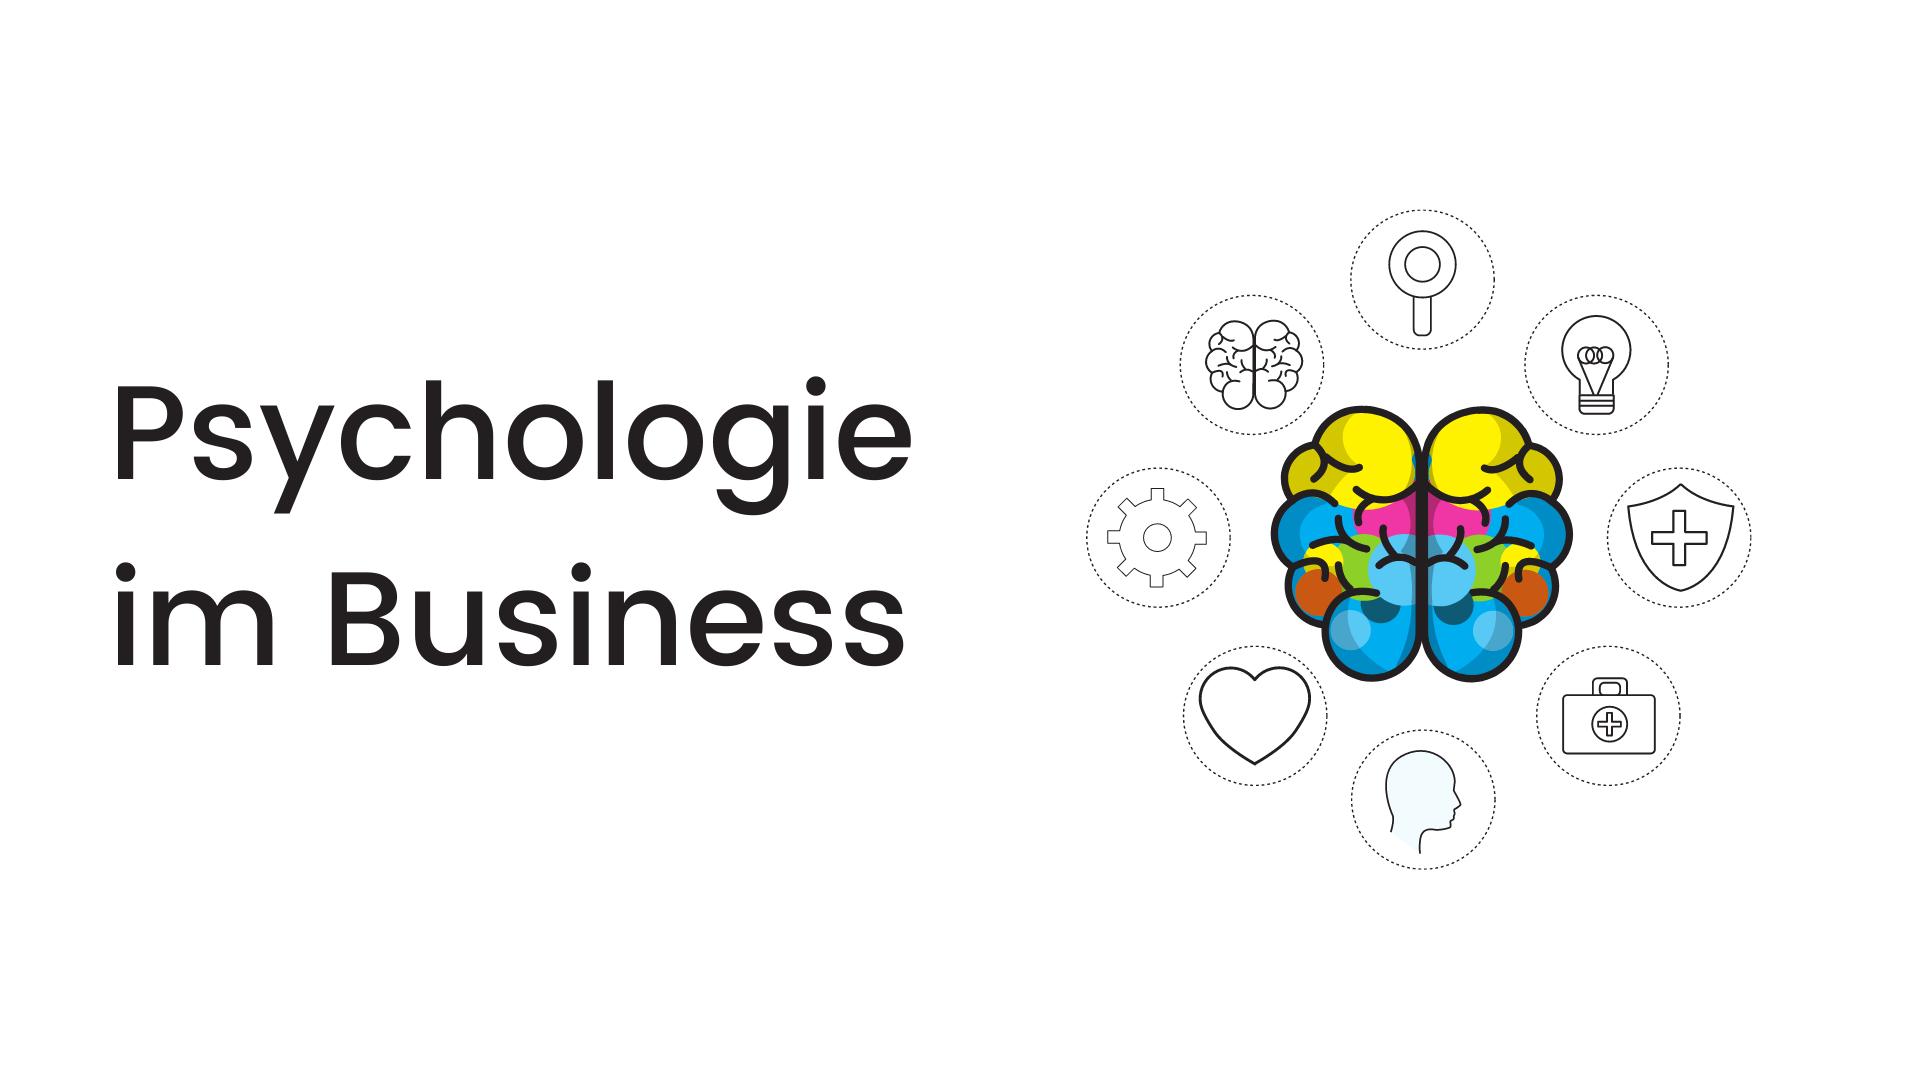 Digital_Coach_Academy_Personal_Branding_Architect_Psychologie